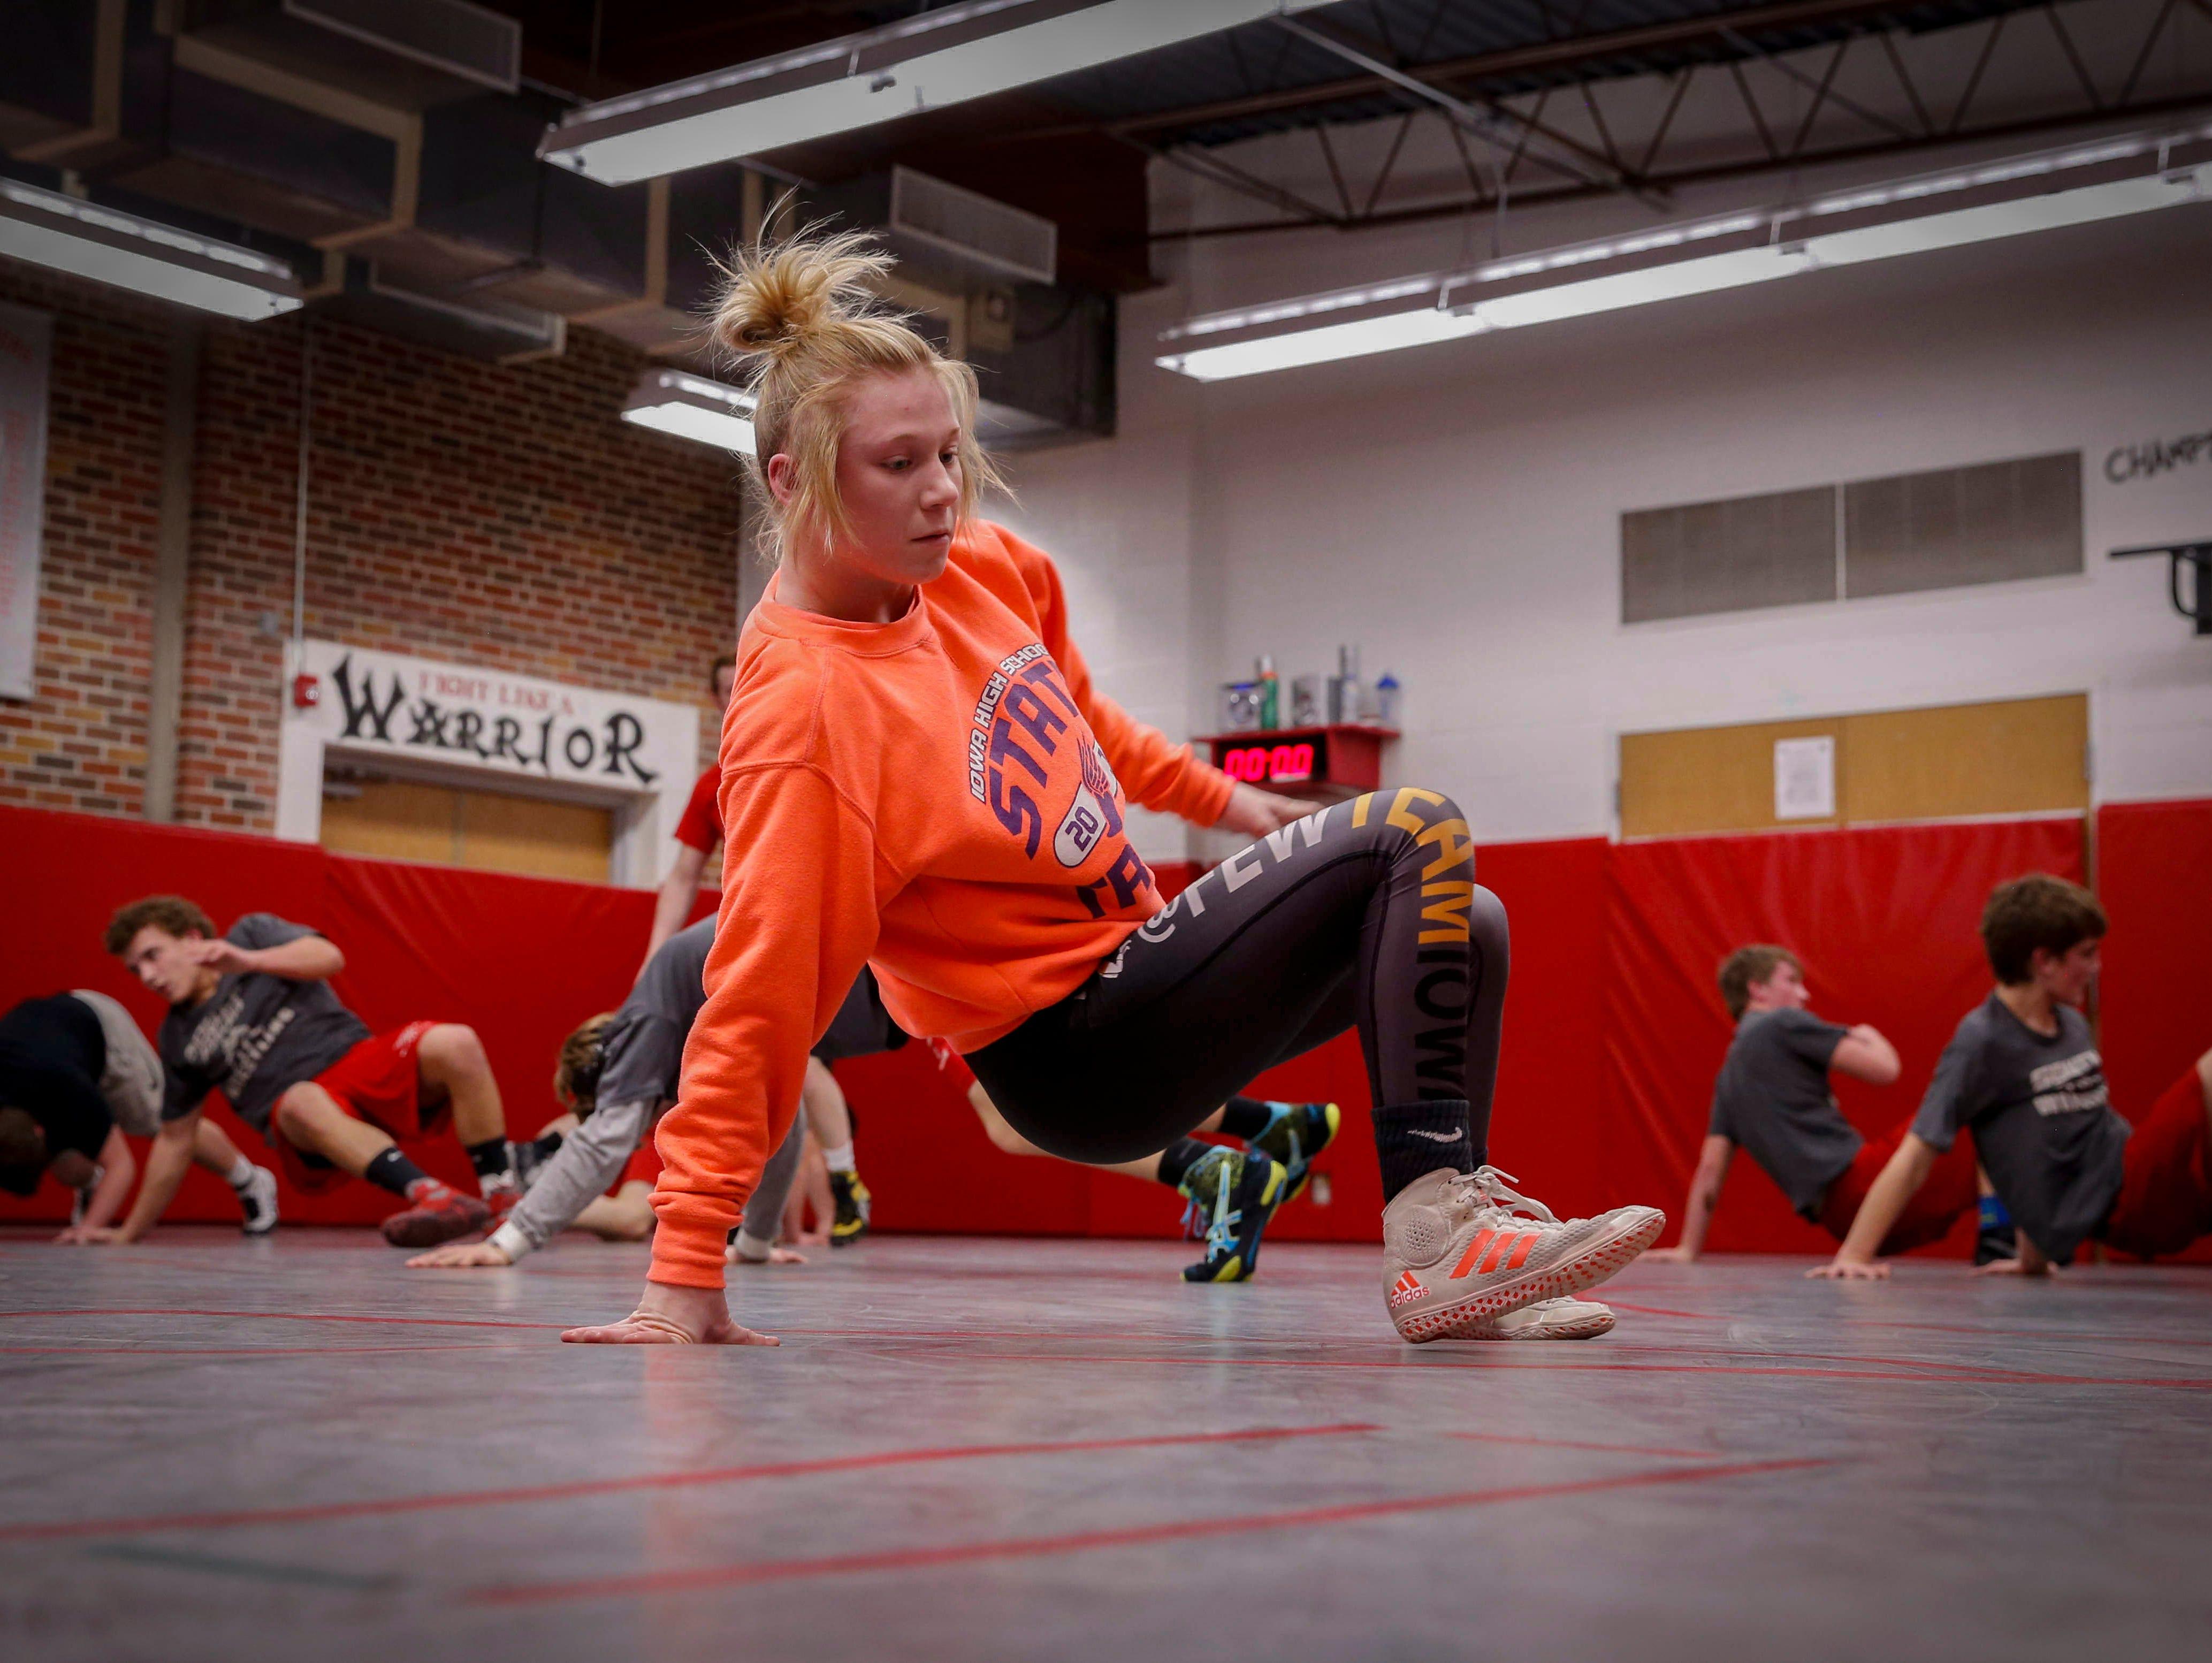 South Winneshiek junior wrestler Felicity Taylor works on techniques during practice on Tuesday, Jan. 31, 2017, at the South Winneshiek High School wrestling room in Calmar, Iowa.